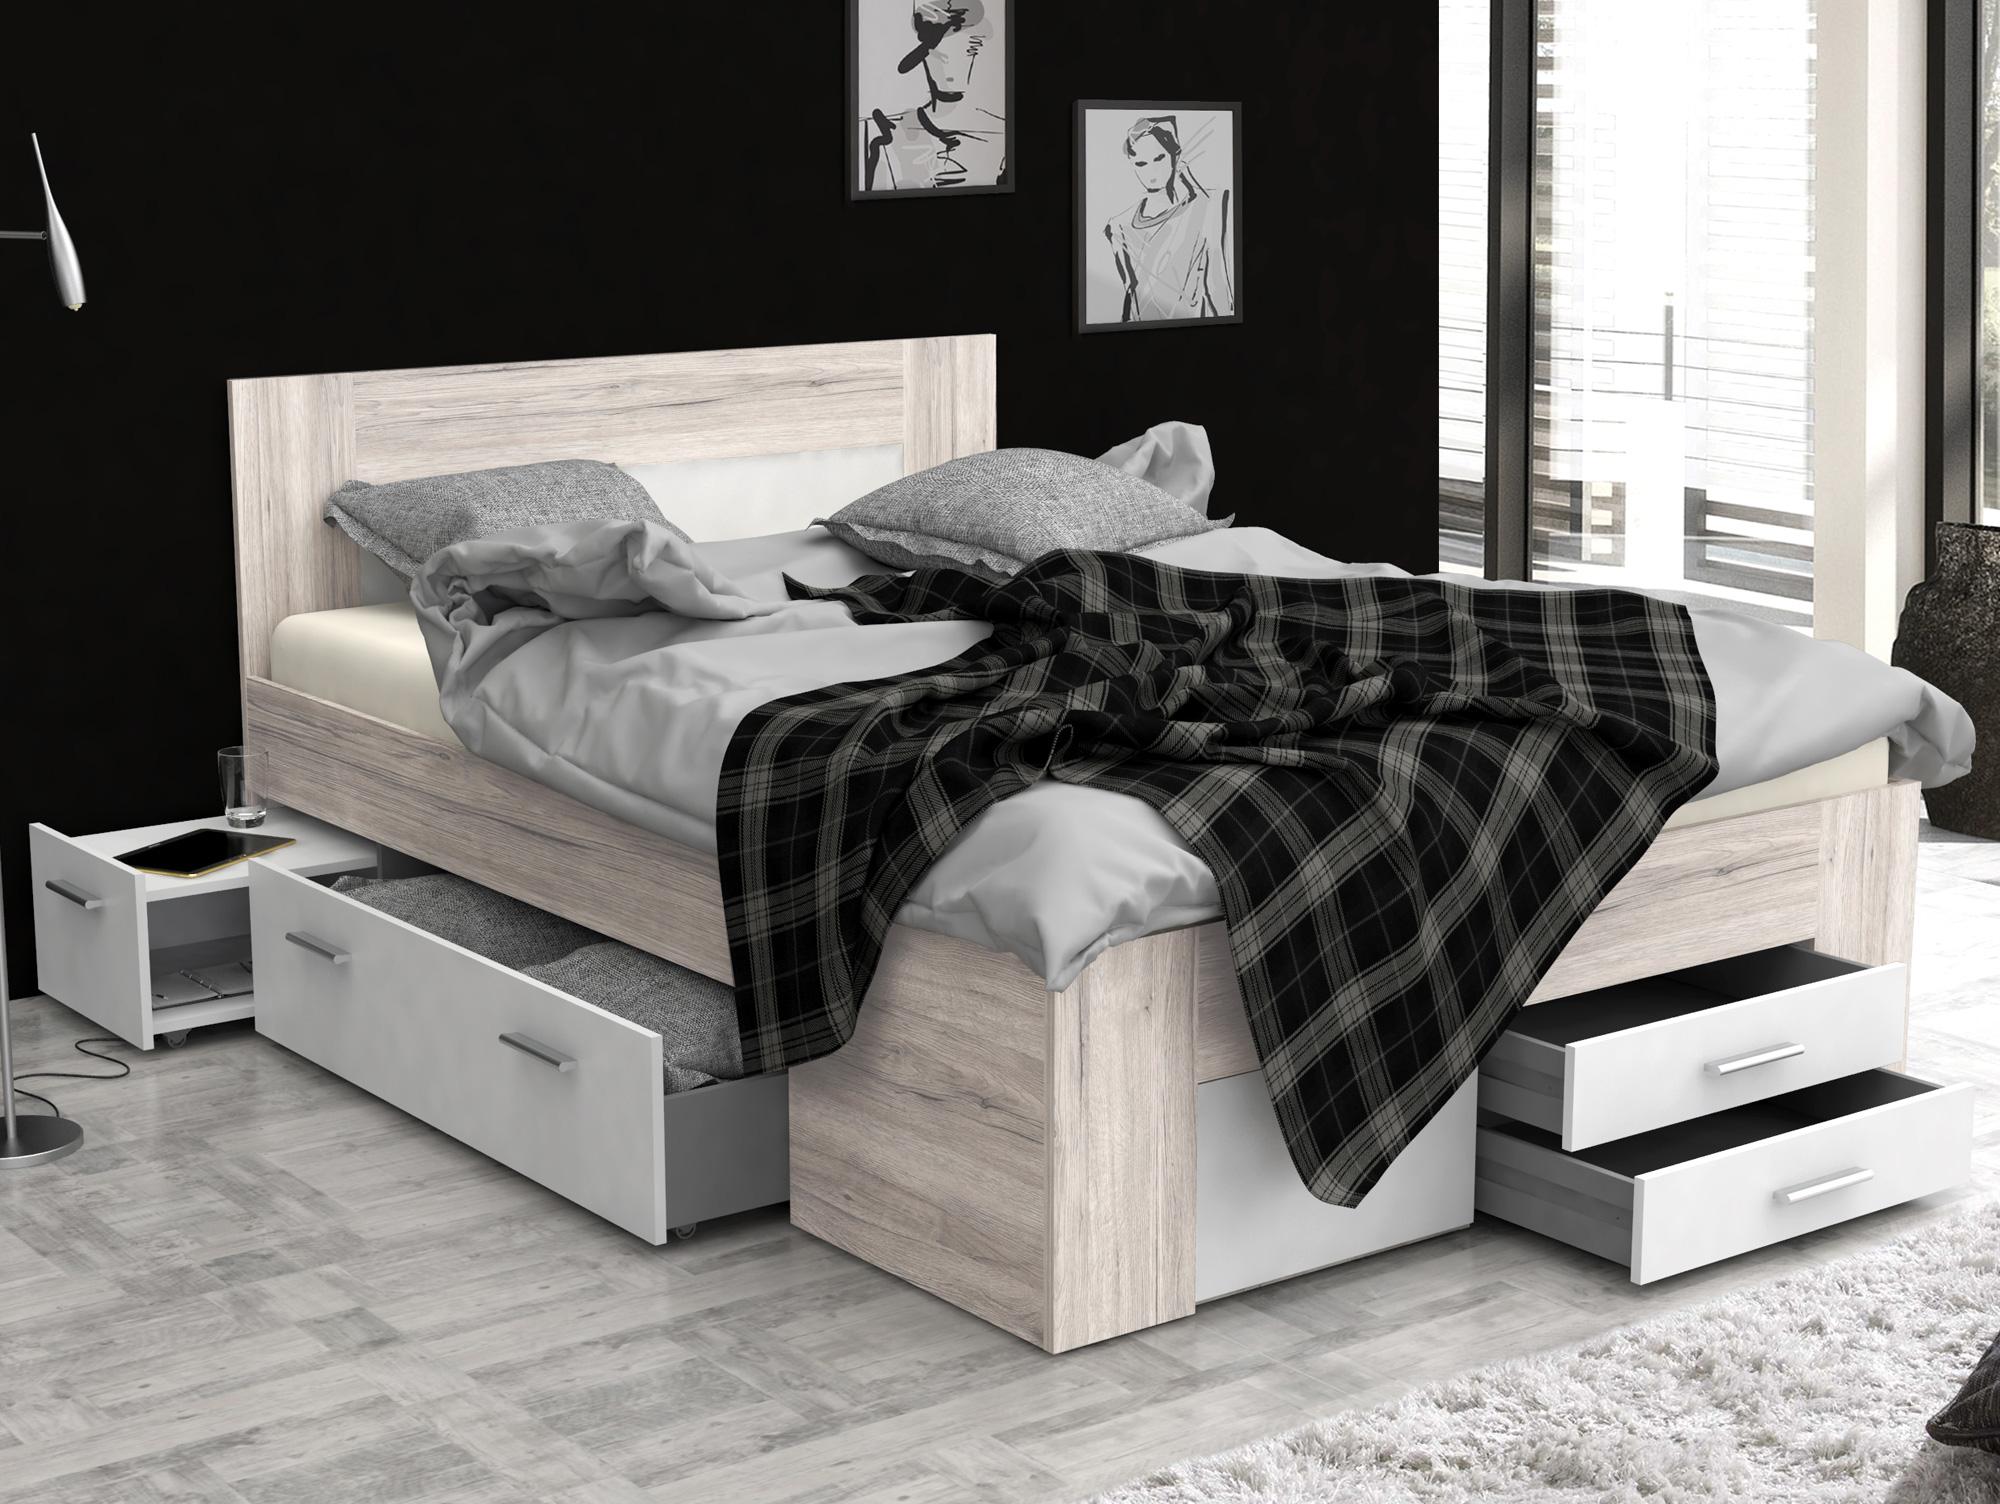 dalia funktionsbett 140x200 cm material dekorspanplatte sandeichefarbig weiss. Black Bedroom Furniture Sets. Home Design Ideas